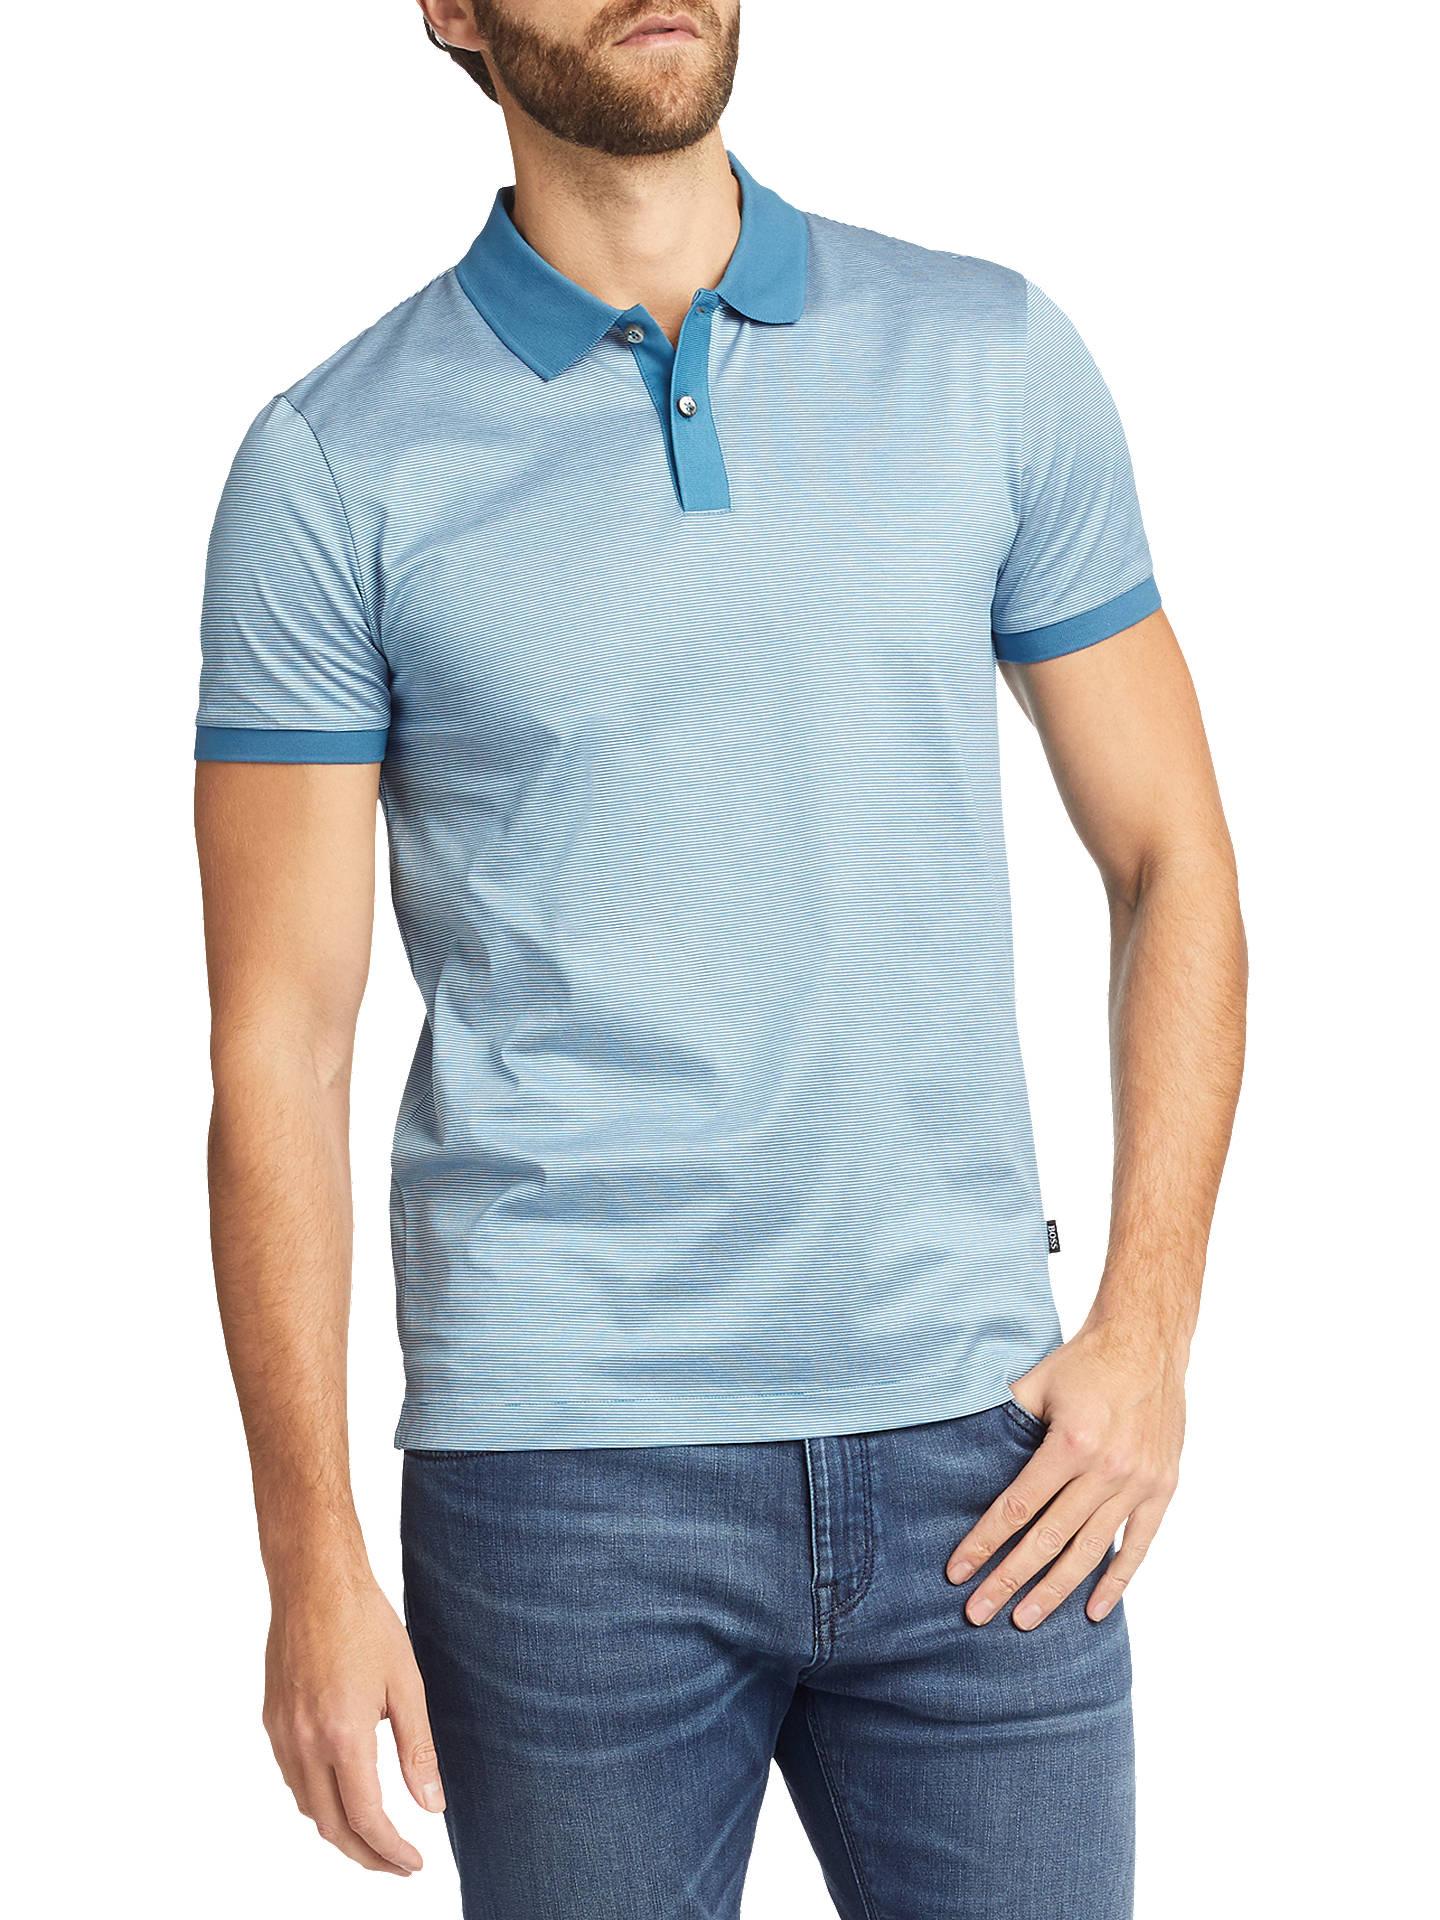 f817de0c9 Buy BOSS Phillipson Short Sleeve Polo Shirt, Turquoise/Aqua, S Online at  johnlewis ...